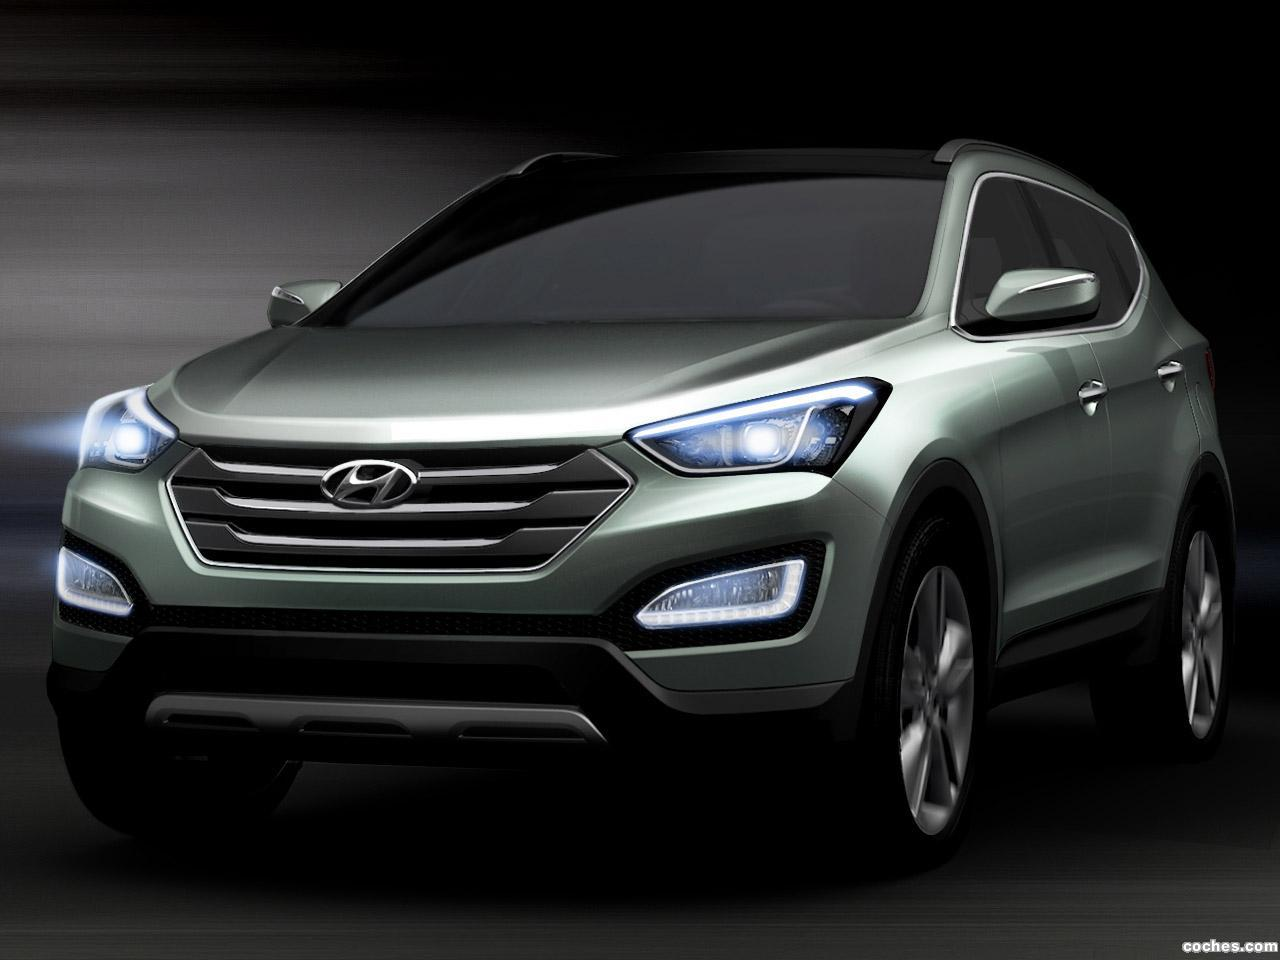 Foto 0 de Hyundai Santa Fe Concept 2012